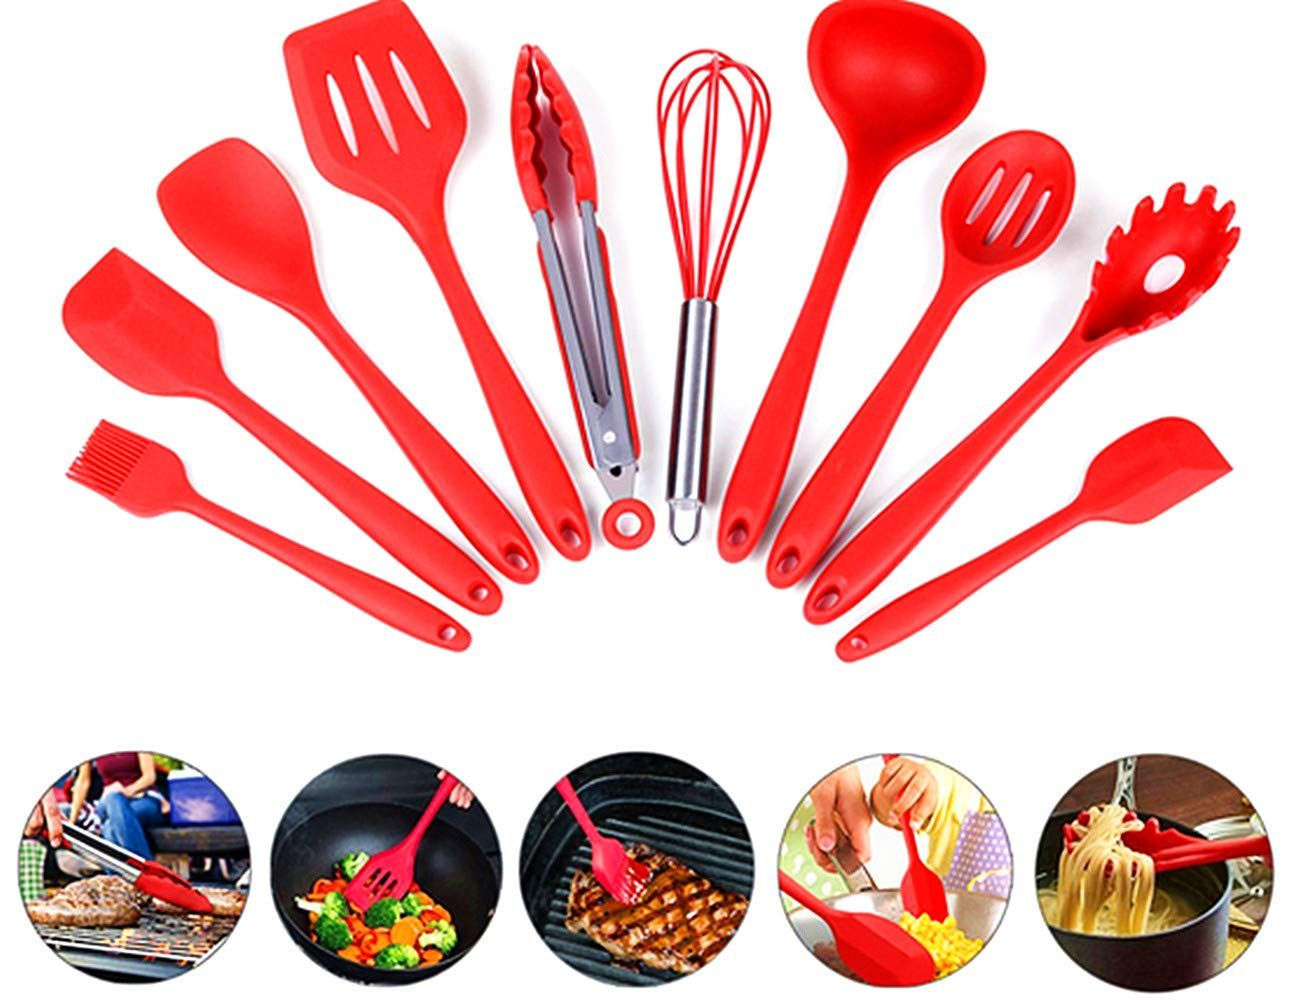 AMLINKER Silicone Heat Resistant Kitchen Cooking Utensil